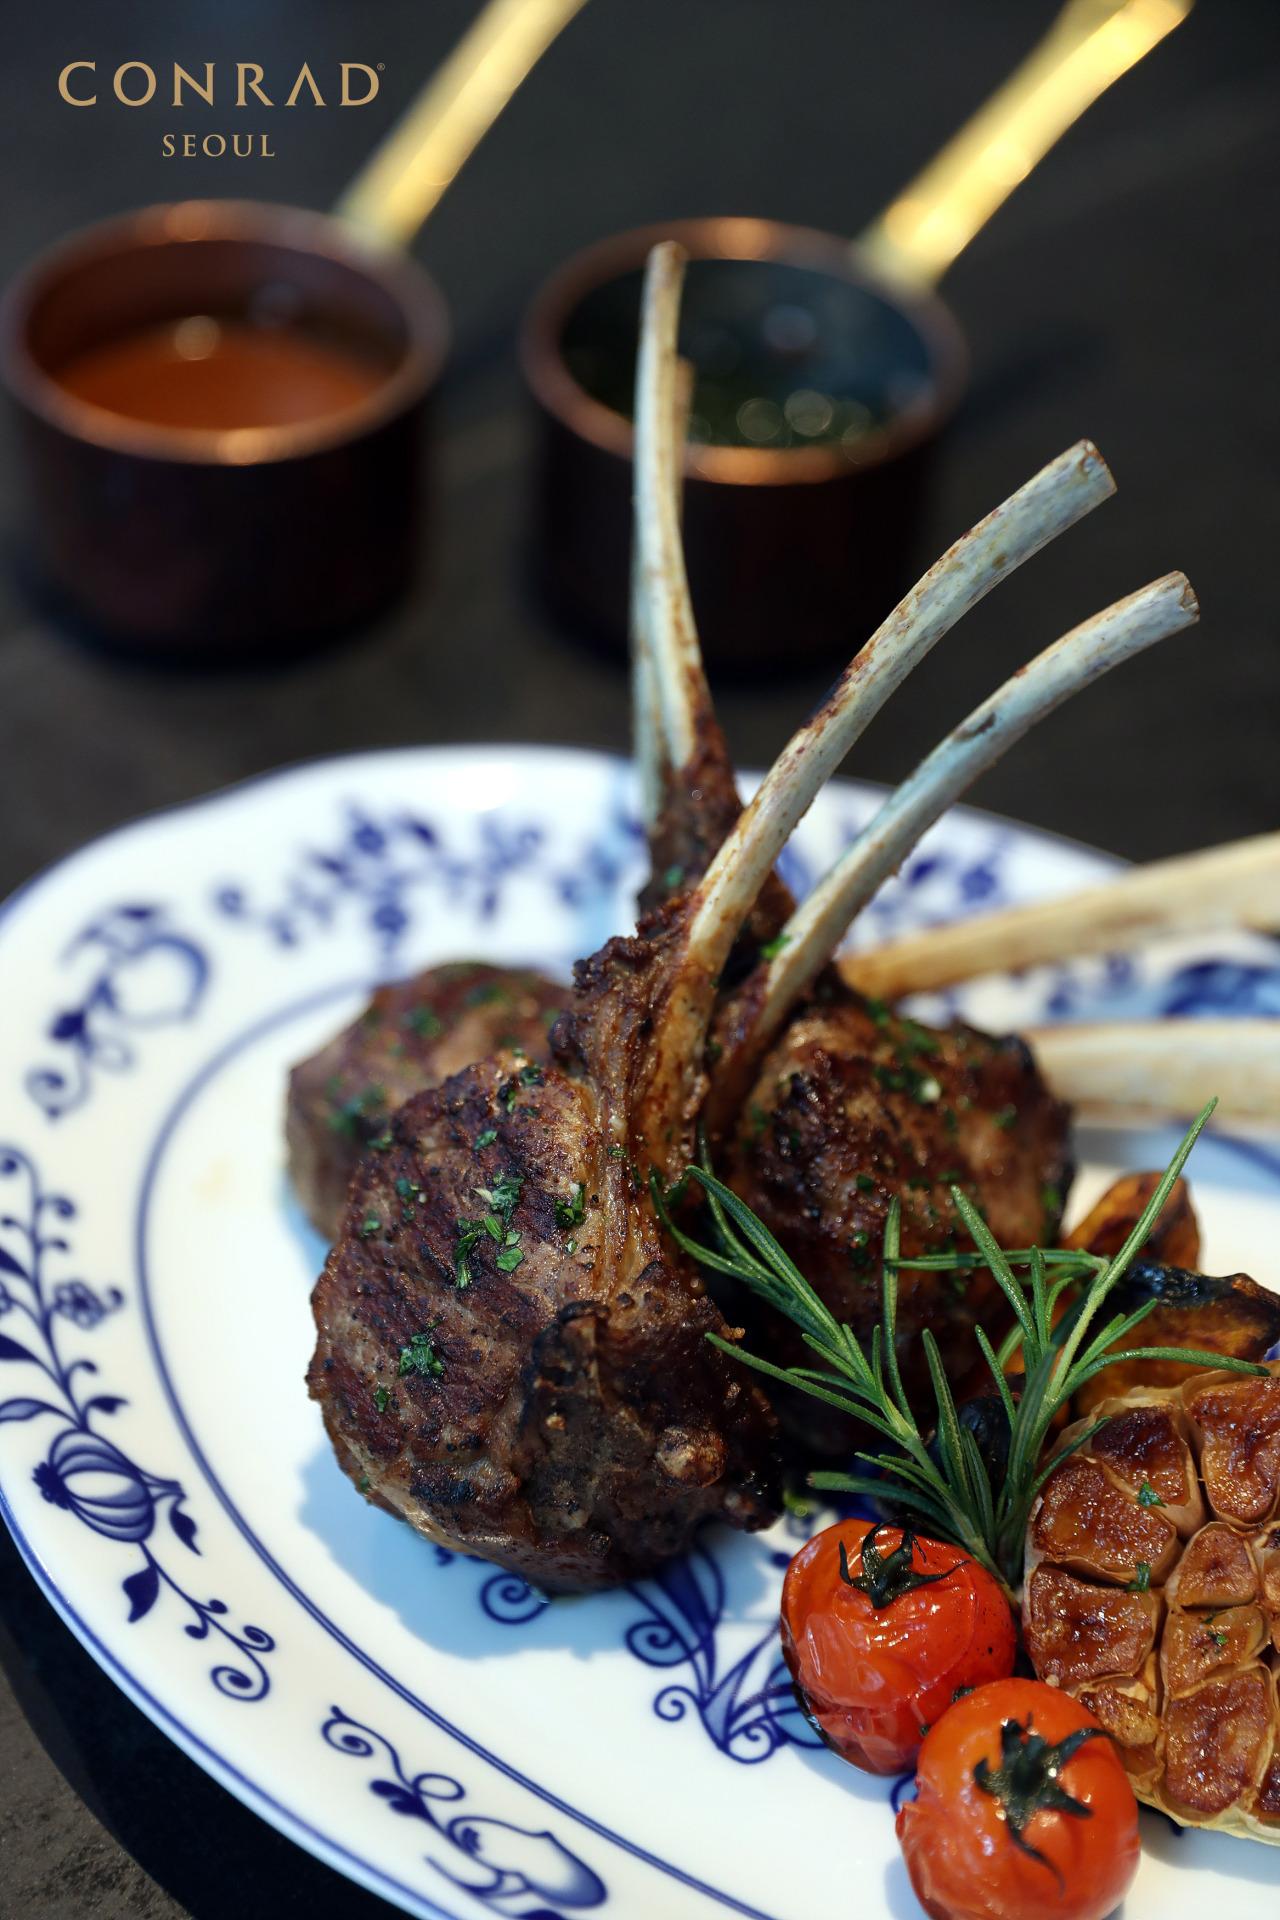 Grilled lamb rack (Conrad Seoul)